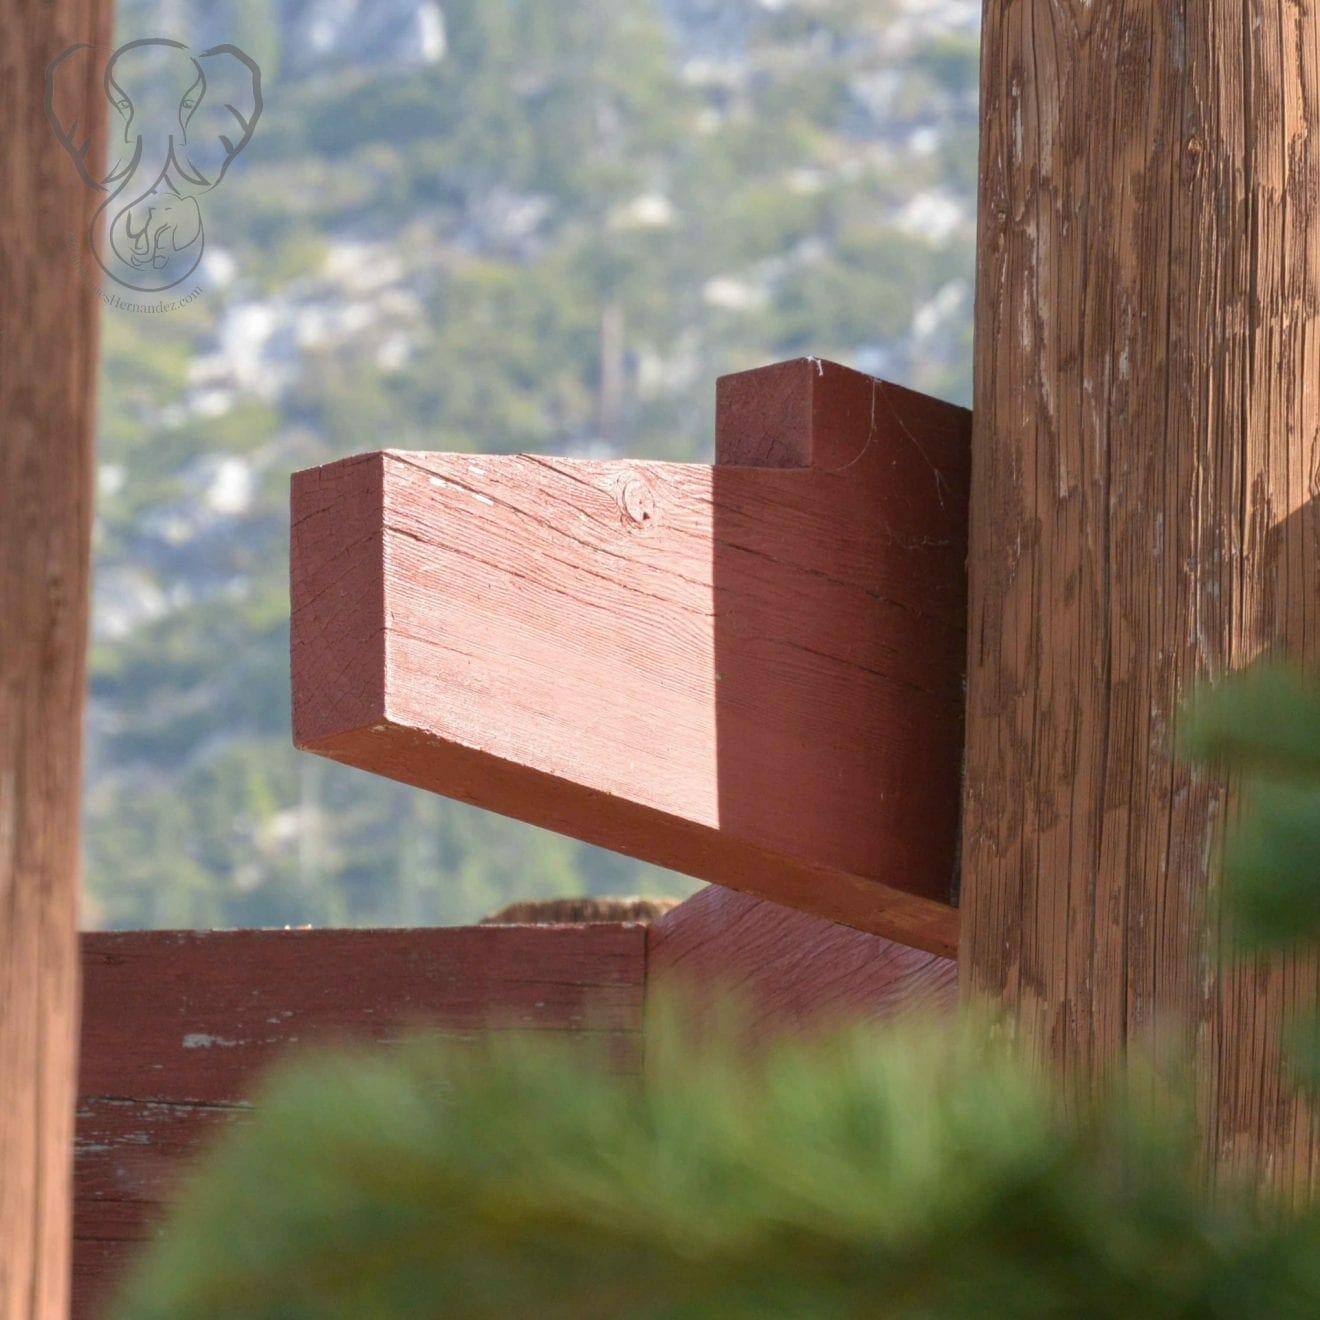 Wooden structure in South Lake Tahoe, California (Miranda Hernandez)